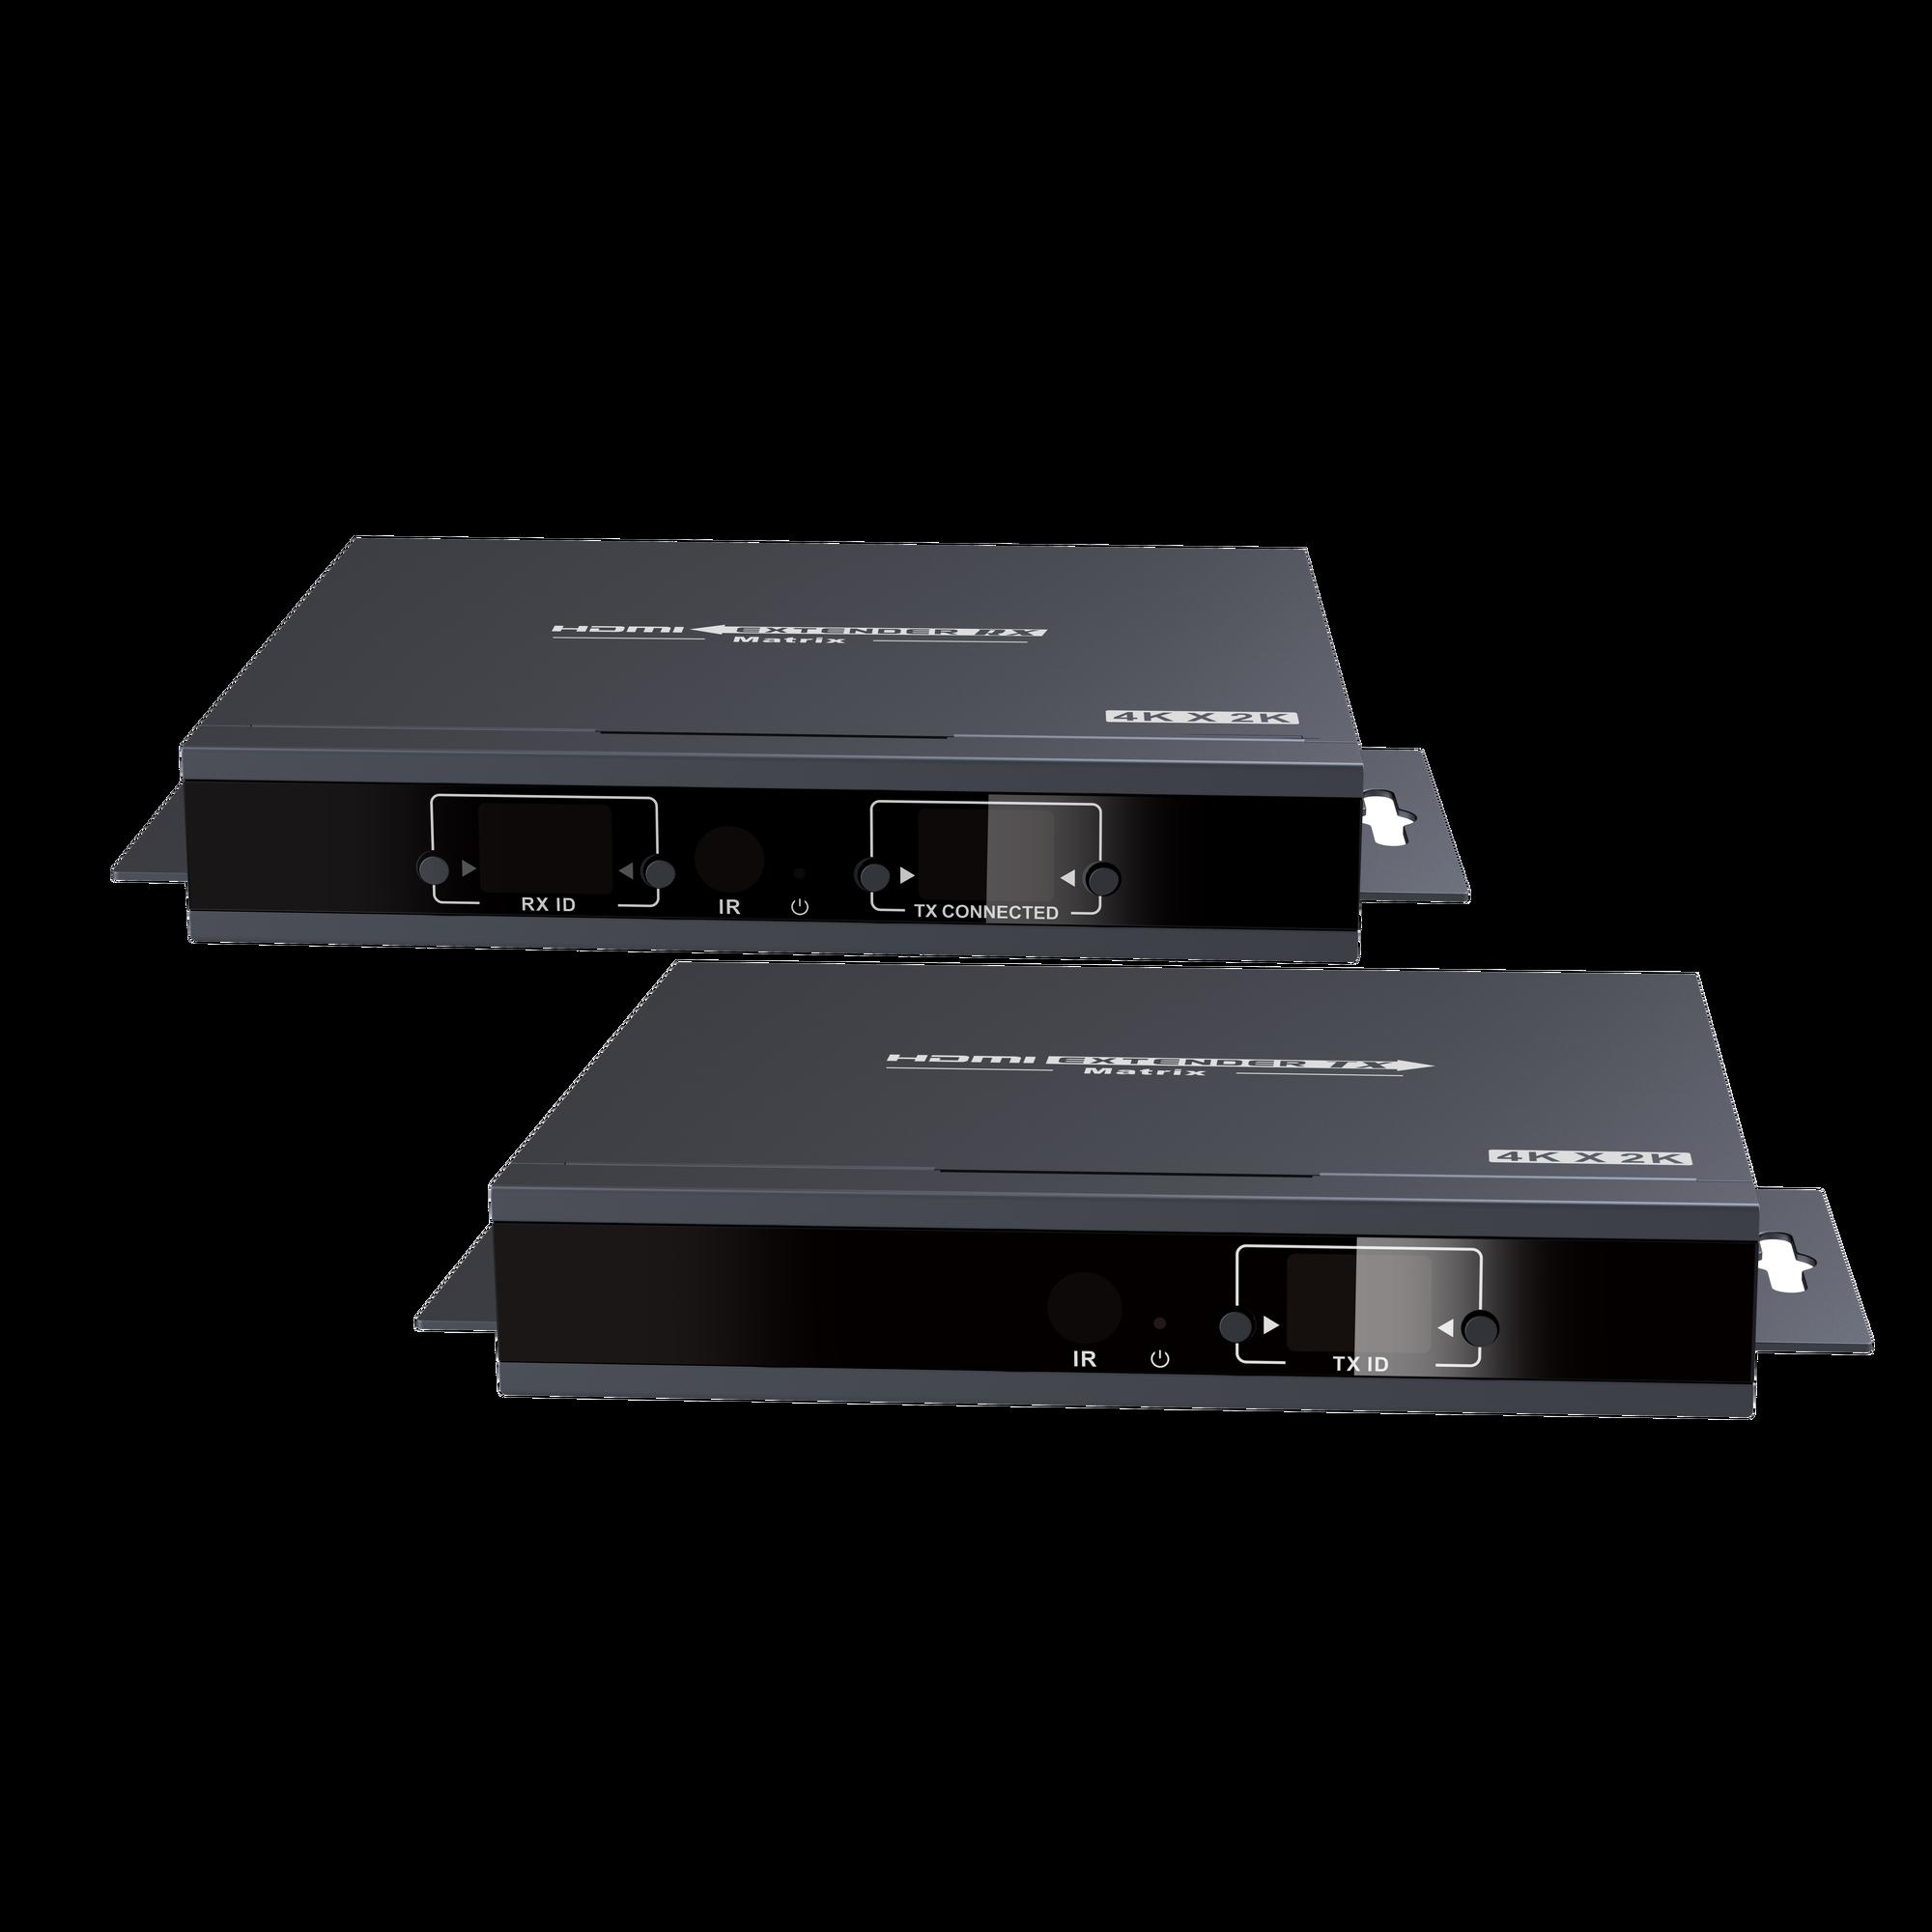 Kit extensor matricial 4K x 2K @ 30 Hz sobre Cat5/6 a 120 /150 metros